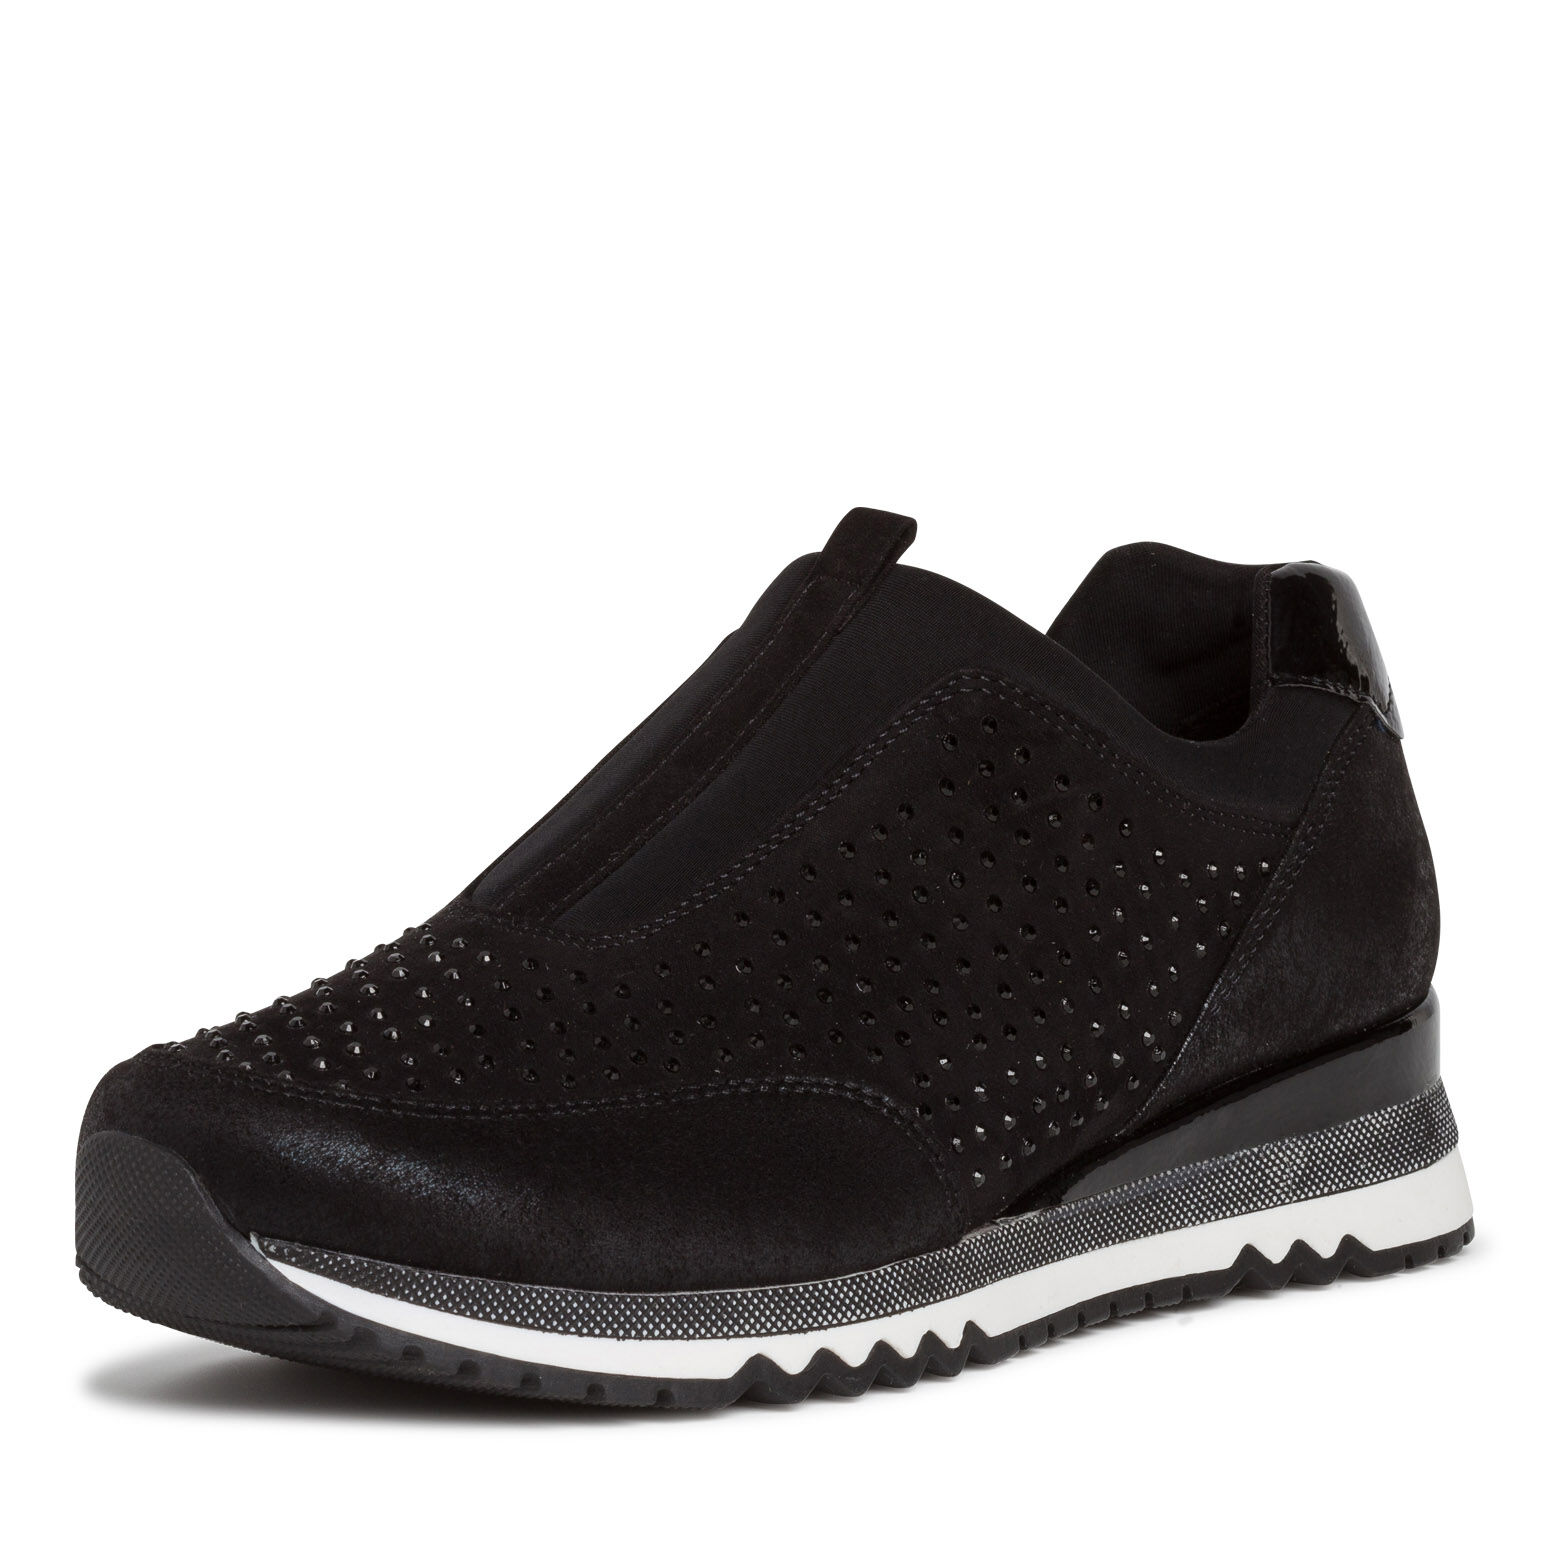 Neue Trends im Jahr 2018 Damen Marco Tozzi Sneaker Low 2 2